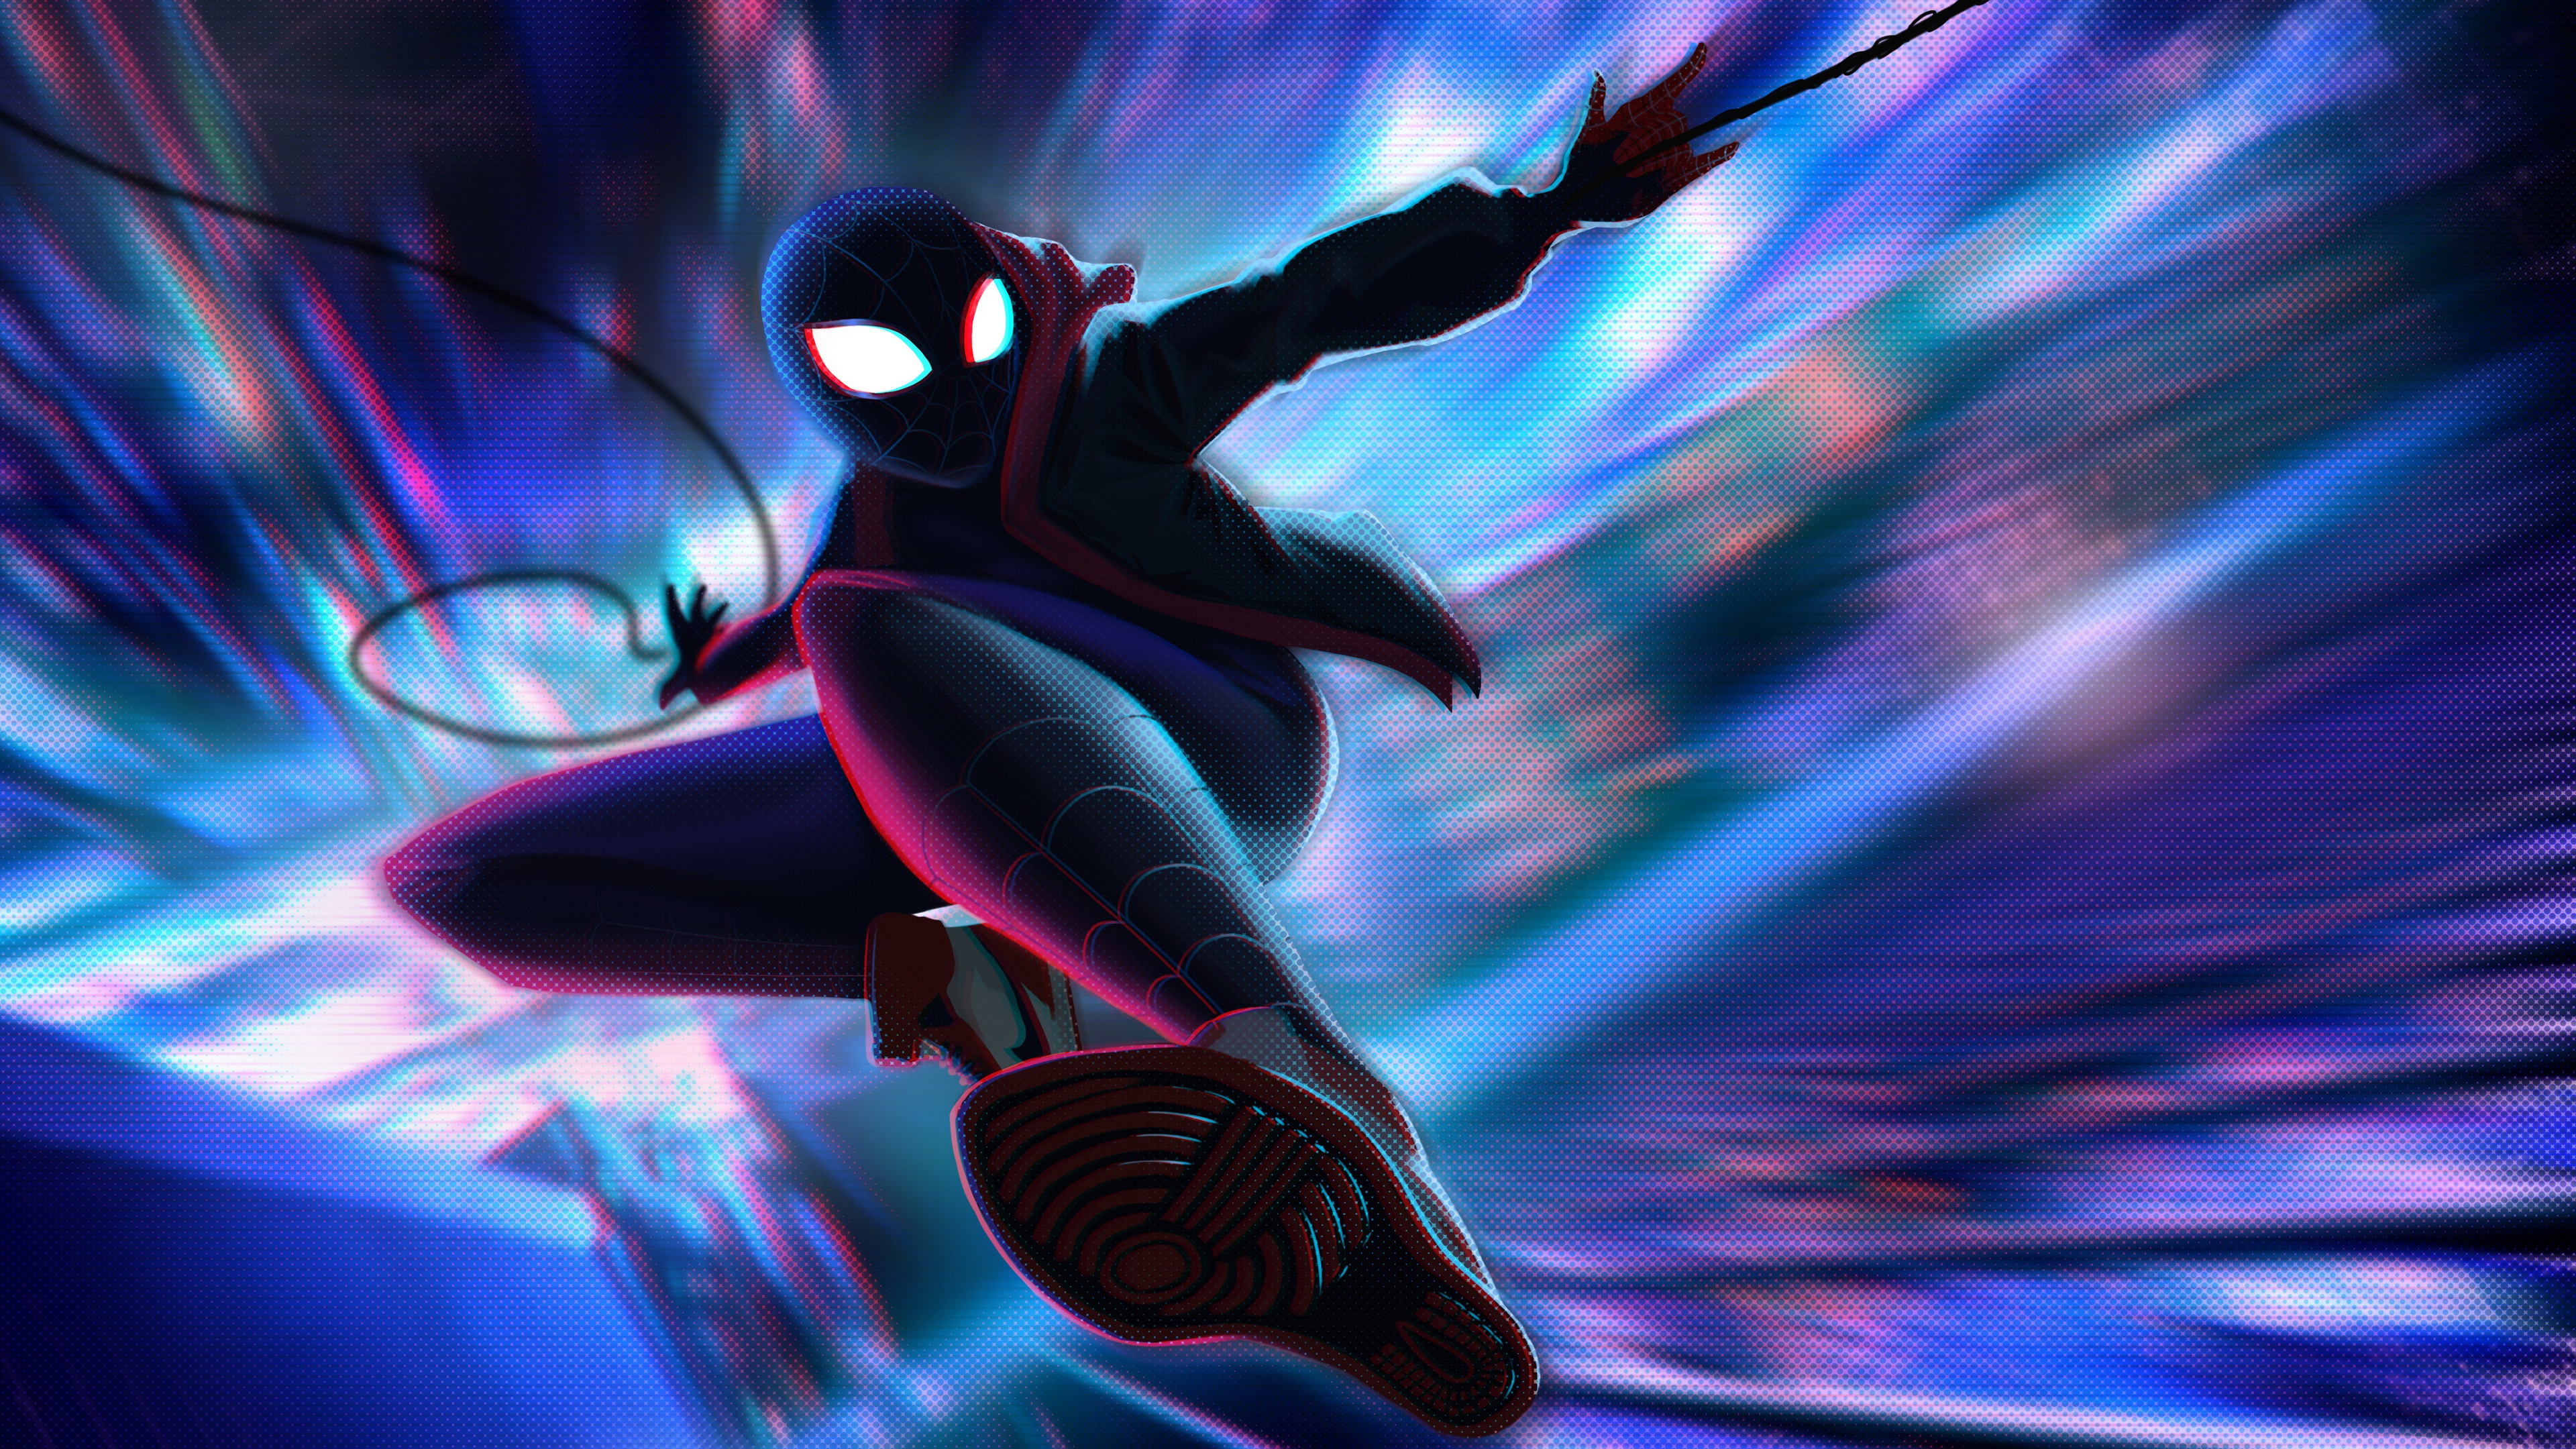 Wallpaper 4k Spiderman Miles Morales Jump 4k 4k Wallpapers 5k